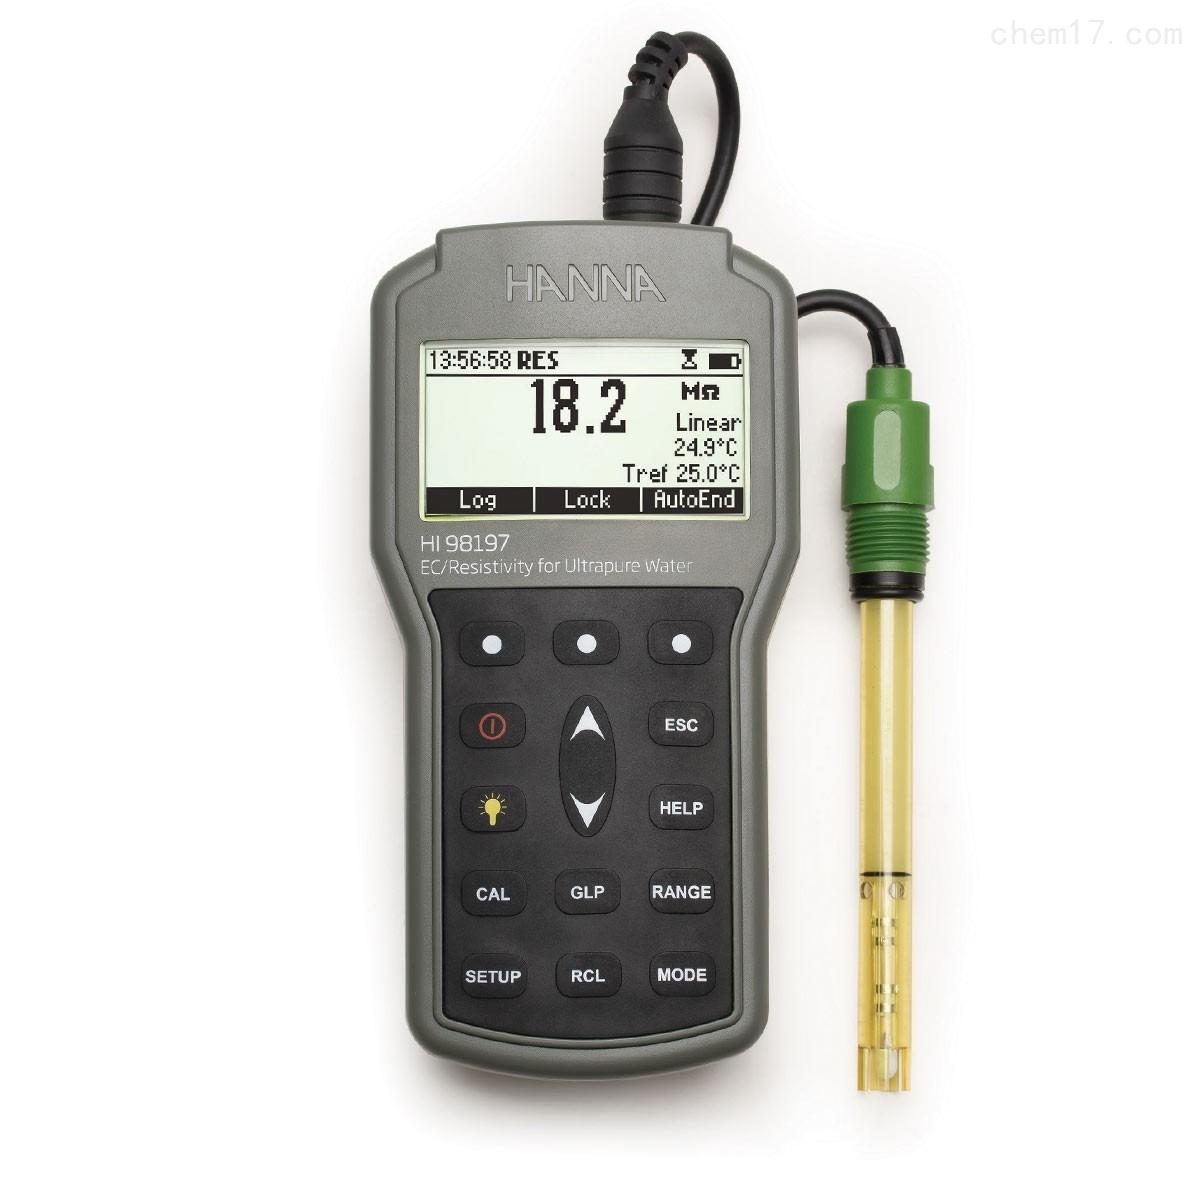 HI98197 超纯水微电脑EC-TDS-电阻率测定仪